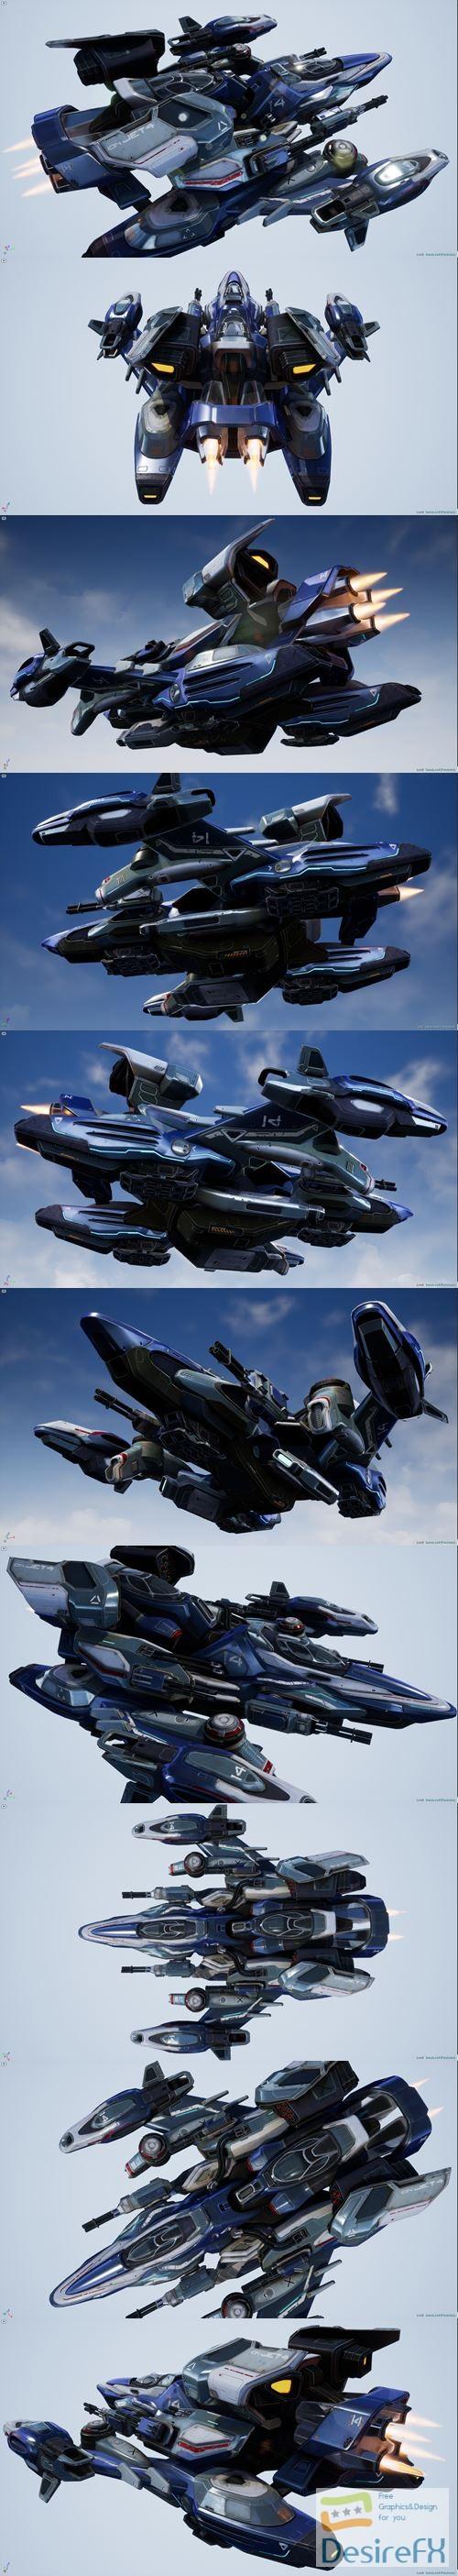 3d-models - Falcon Spaceship - game 3D Model